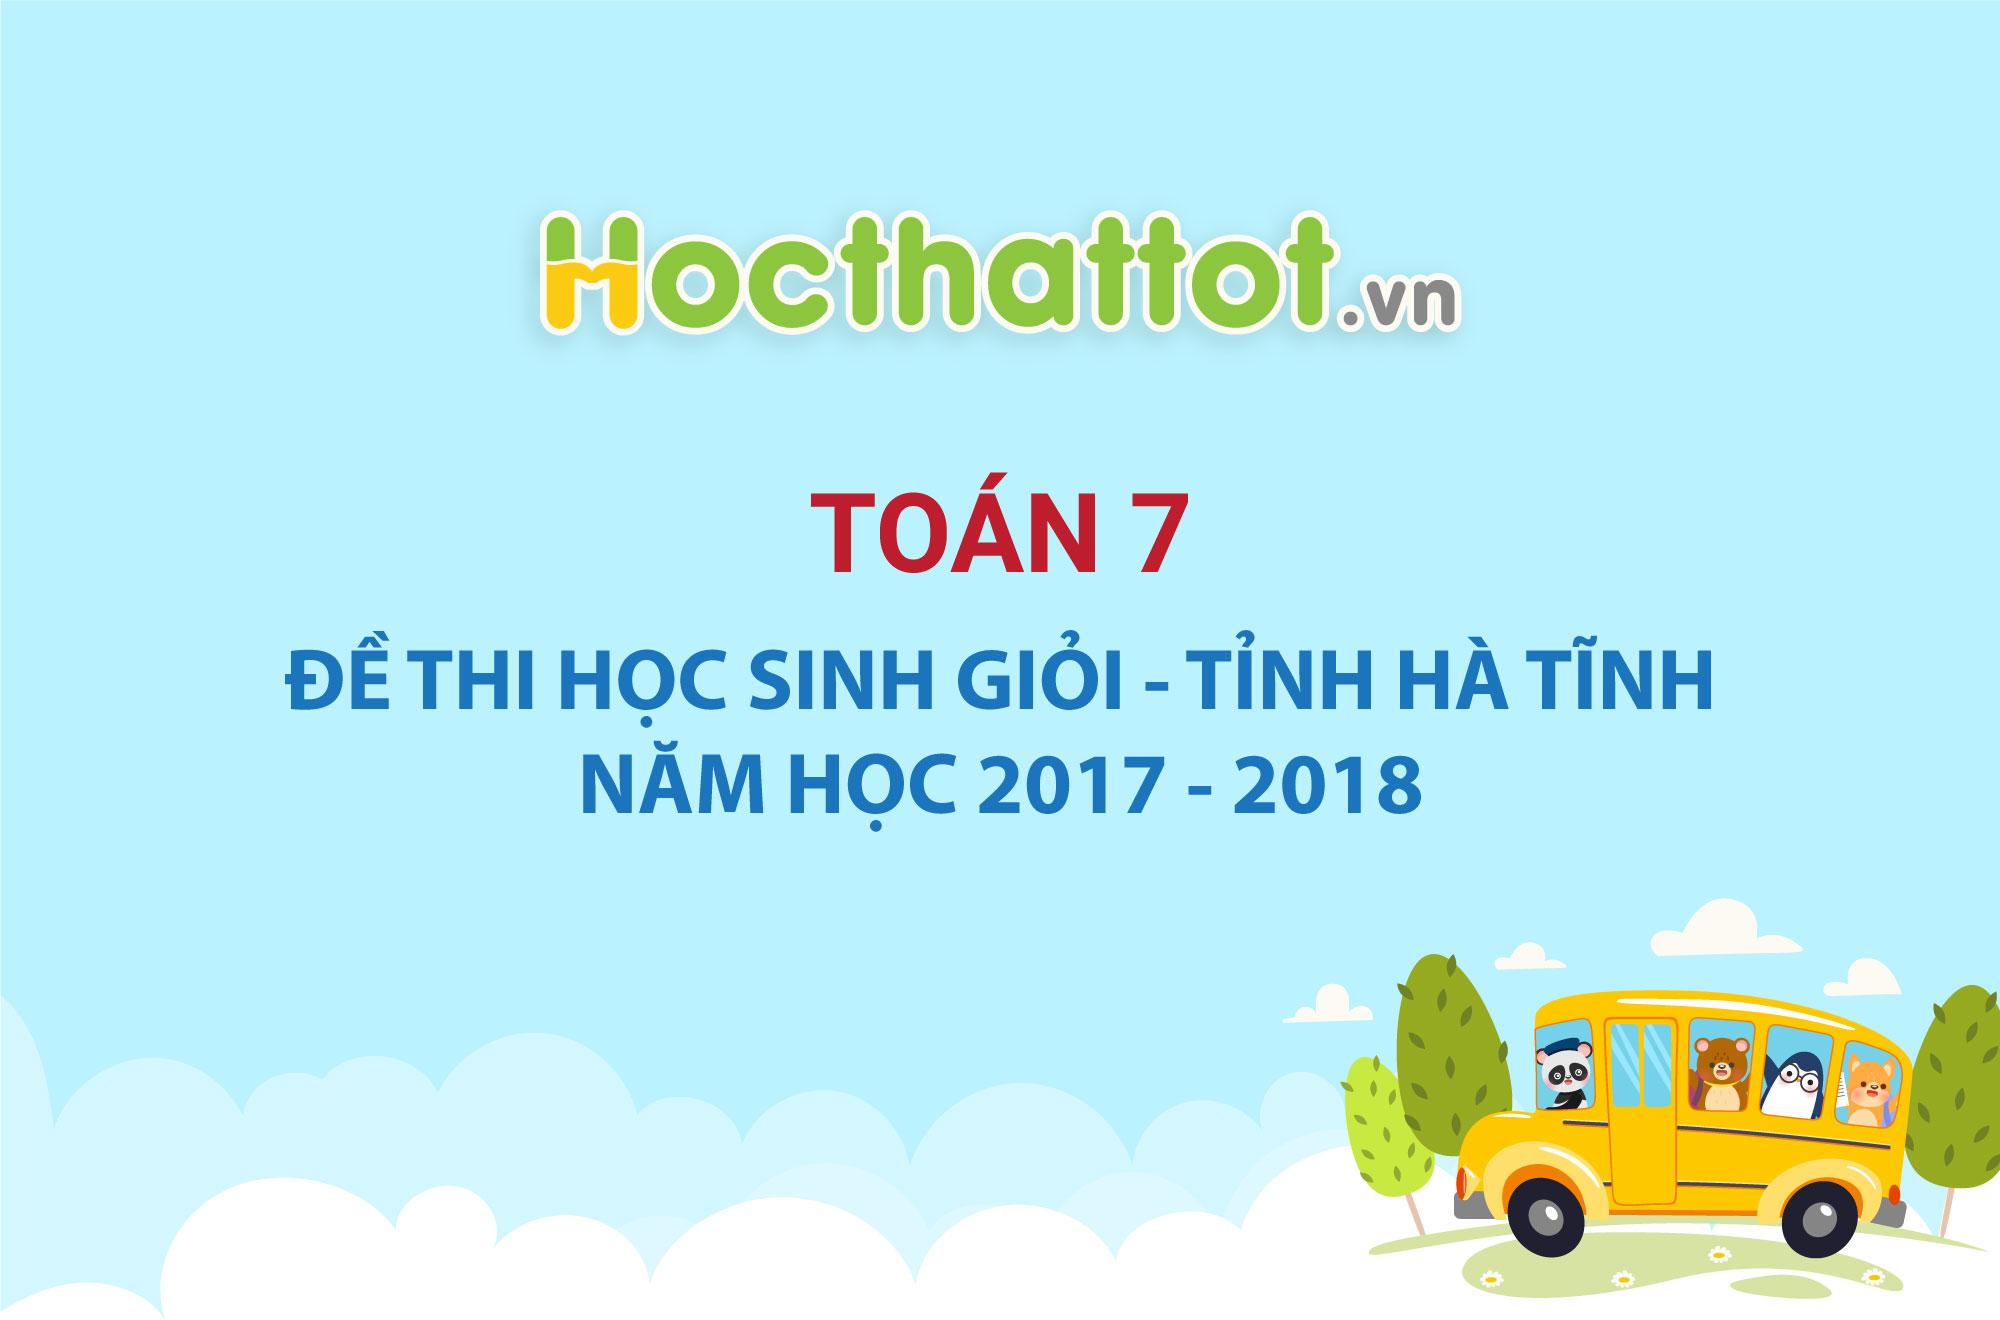 hsg-7-ha-tinh-2018